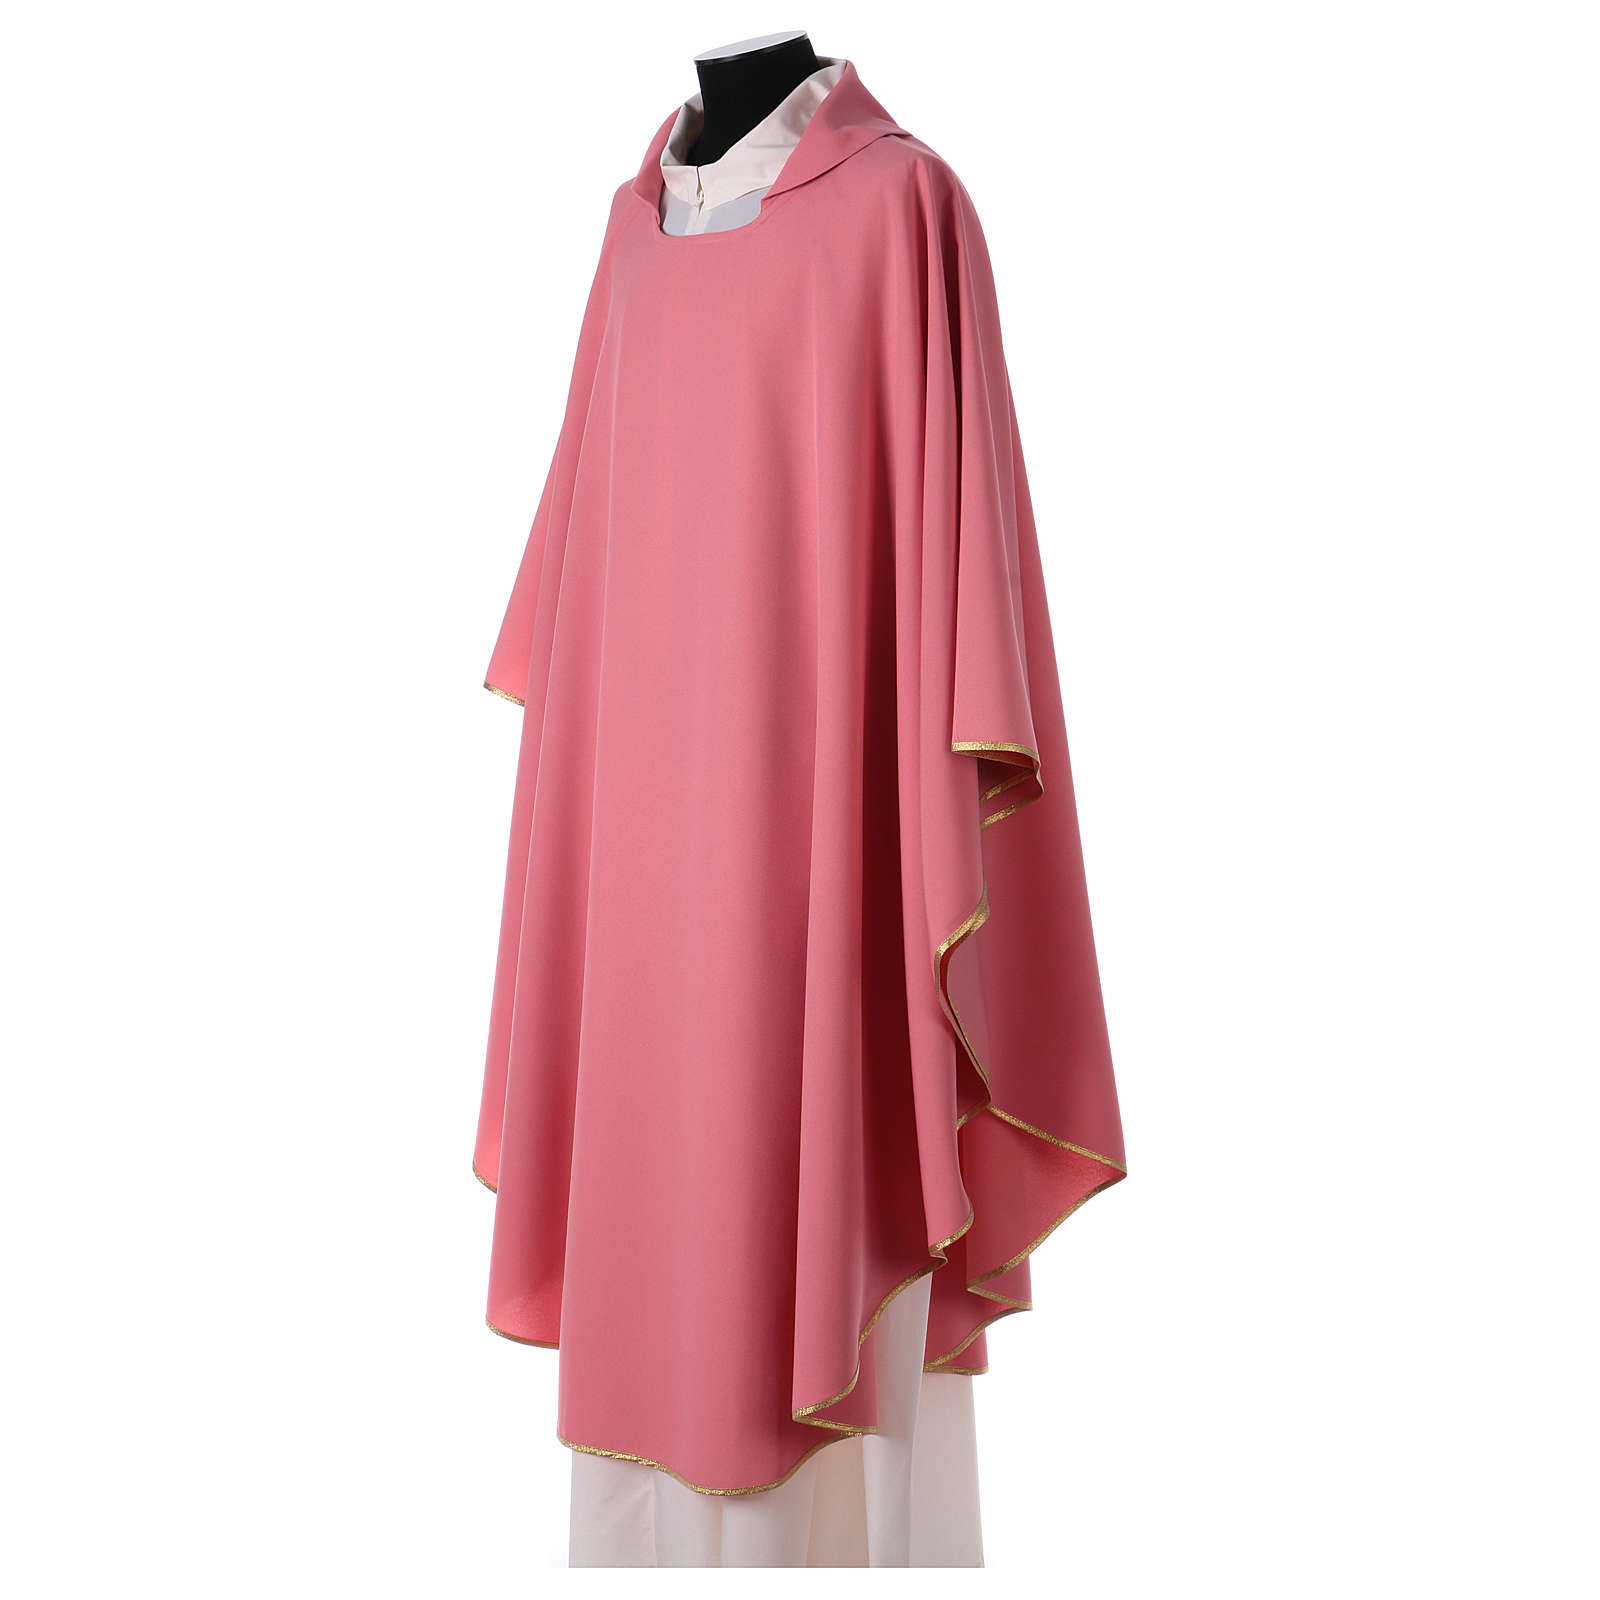 Casula poliestere rosa 4